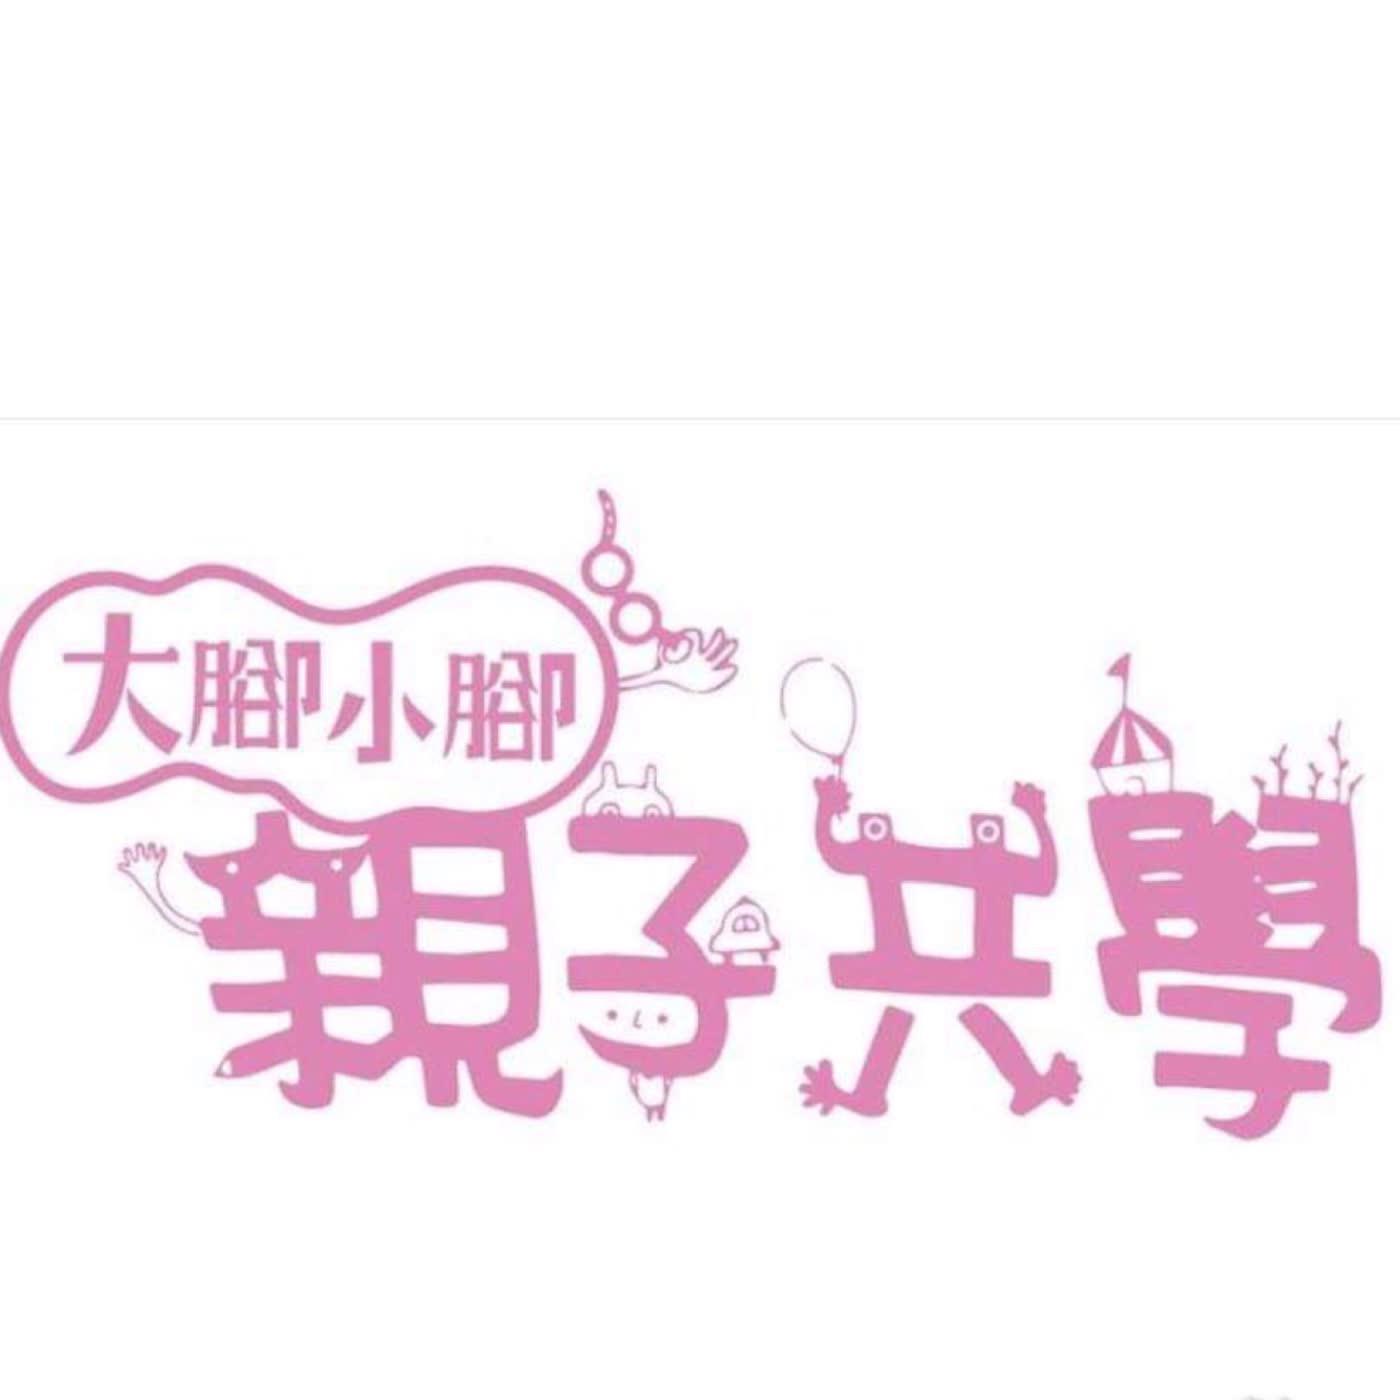 ☁️【故事分享】彩虹獸獸-嘉義彩虹生活節原創、大腳小腳雲嘉親子共學團改編